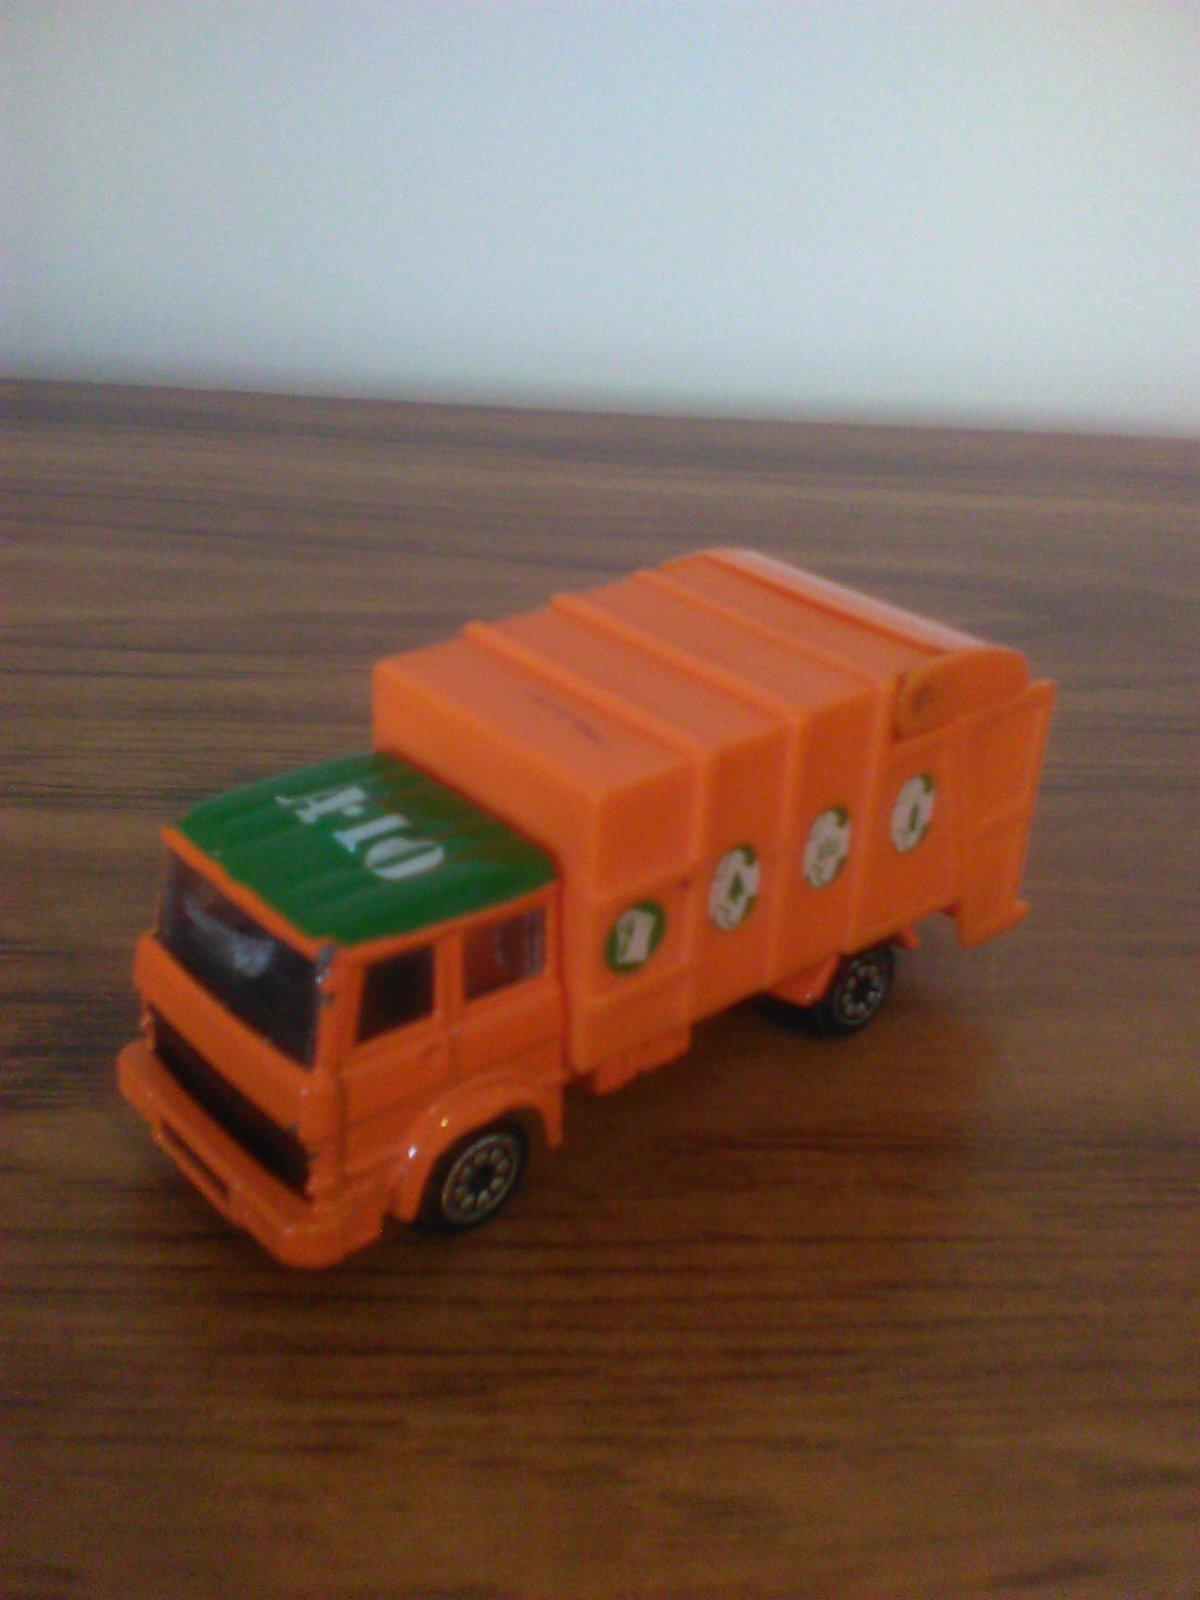 Refuse Truck (Corgi)